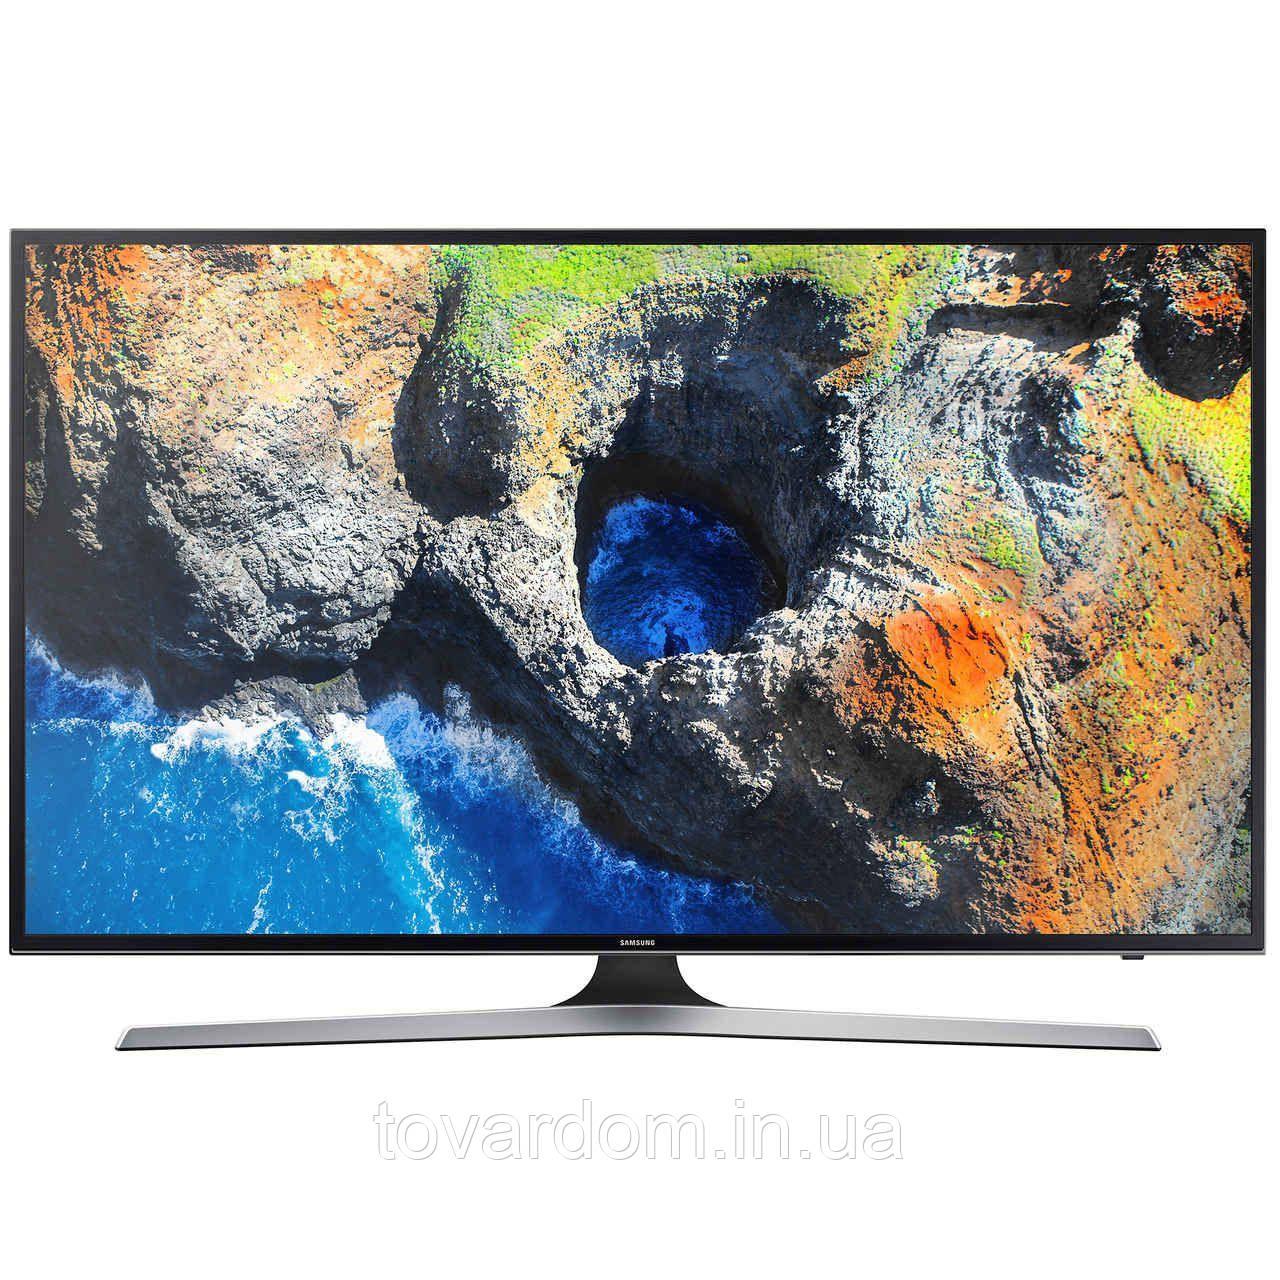 Телевизор Samsung UE43RU7470UXUA